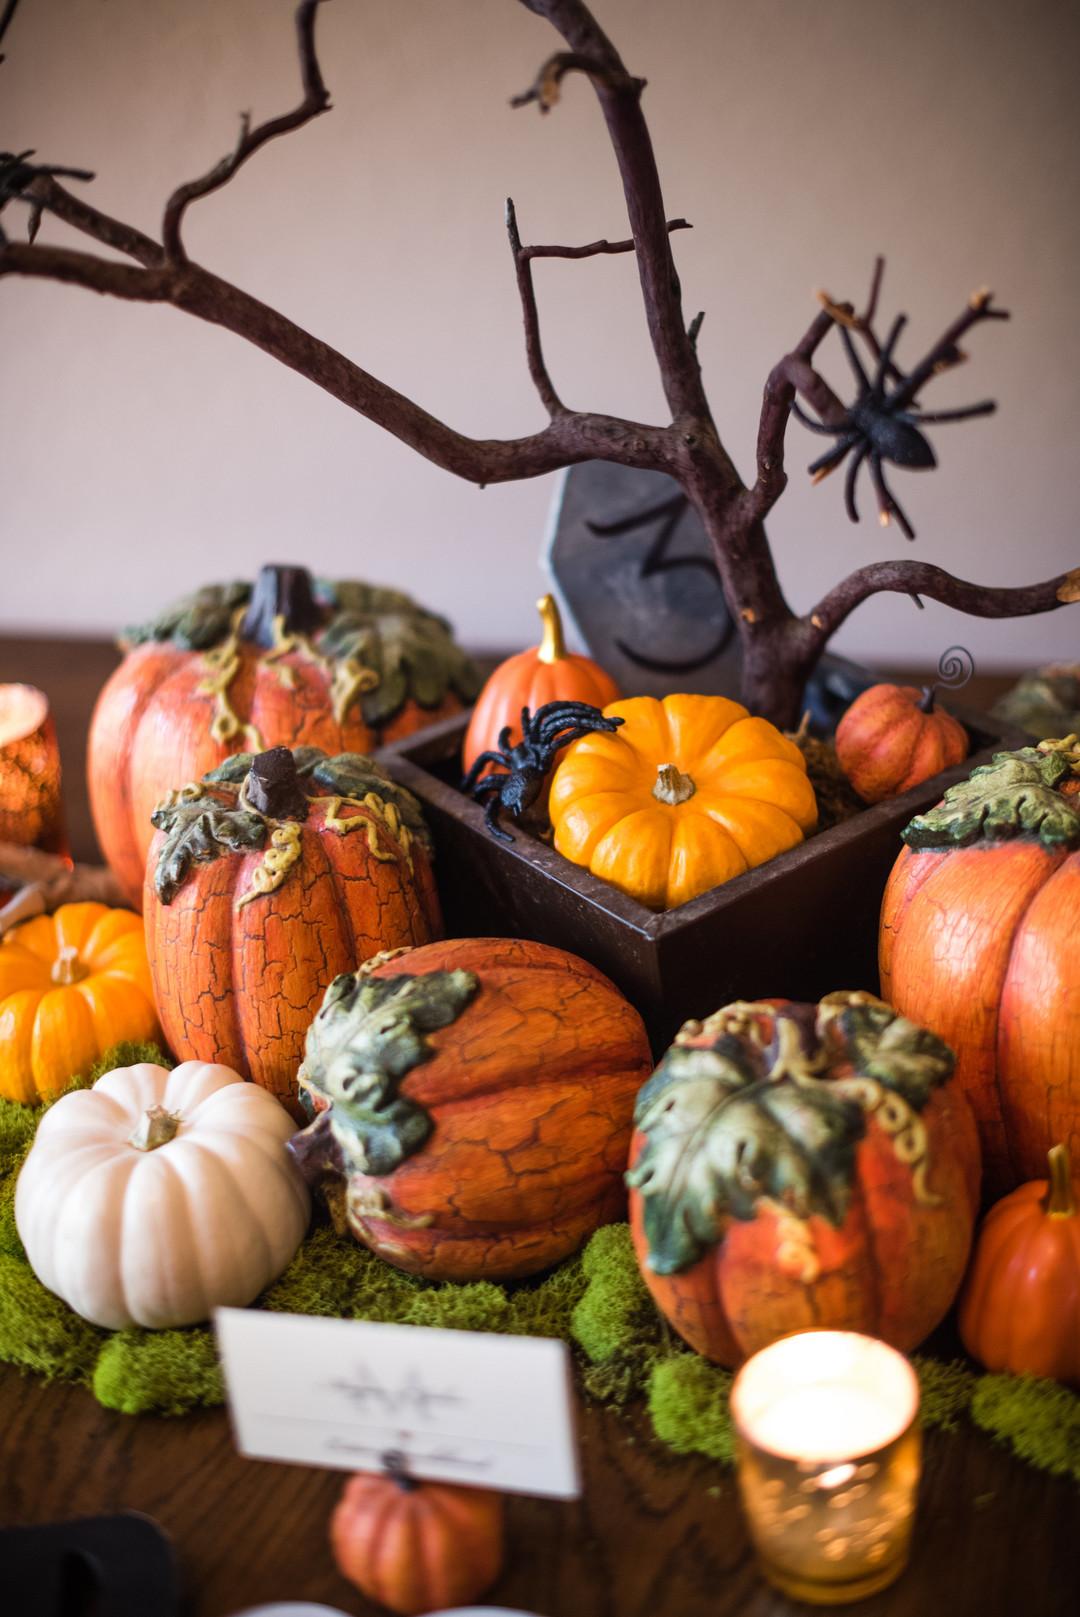 Halloween centerpiece with pumpkins, spiders and gravestone marker